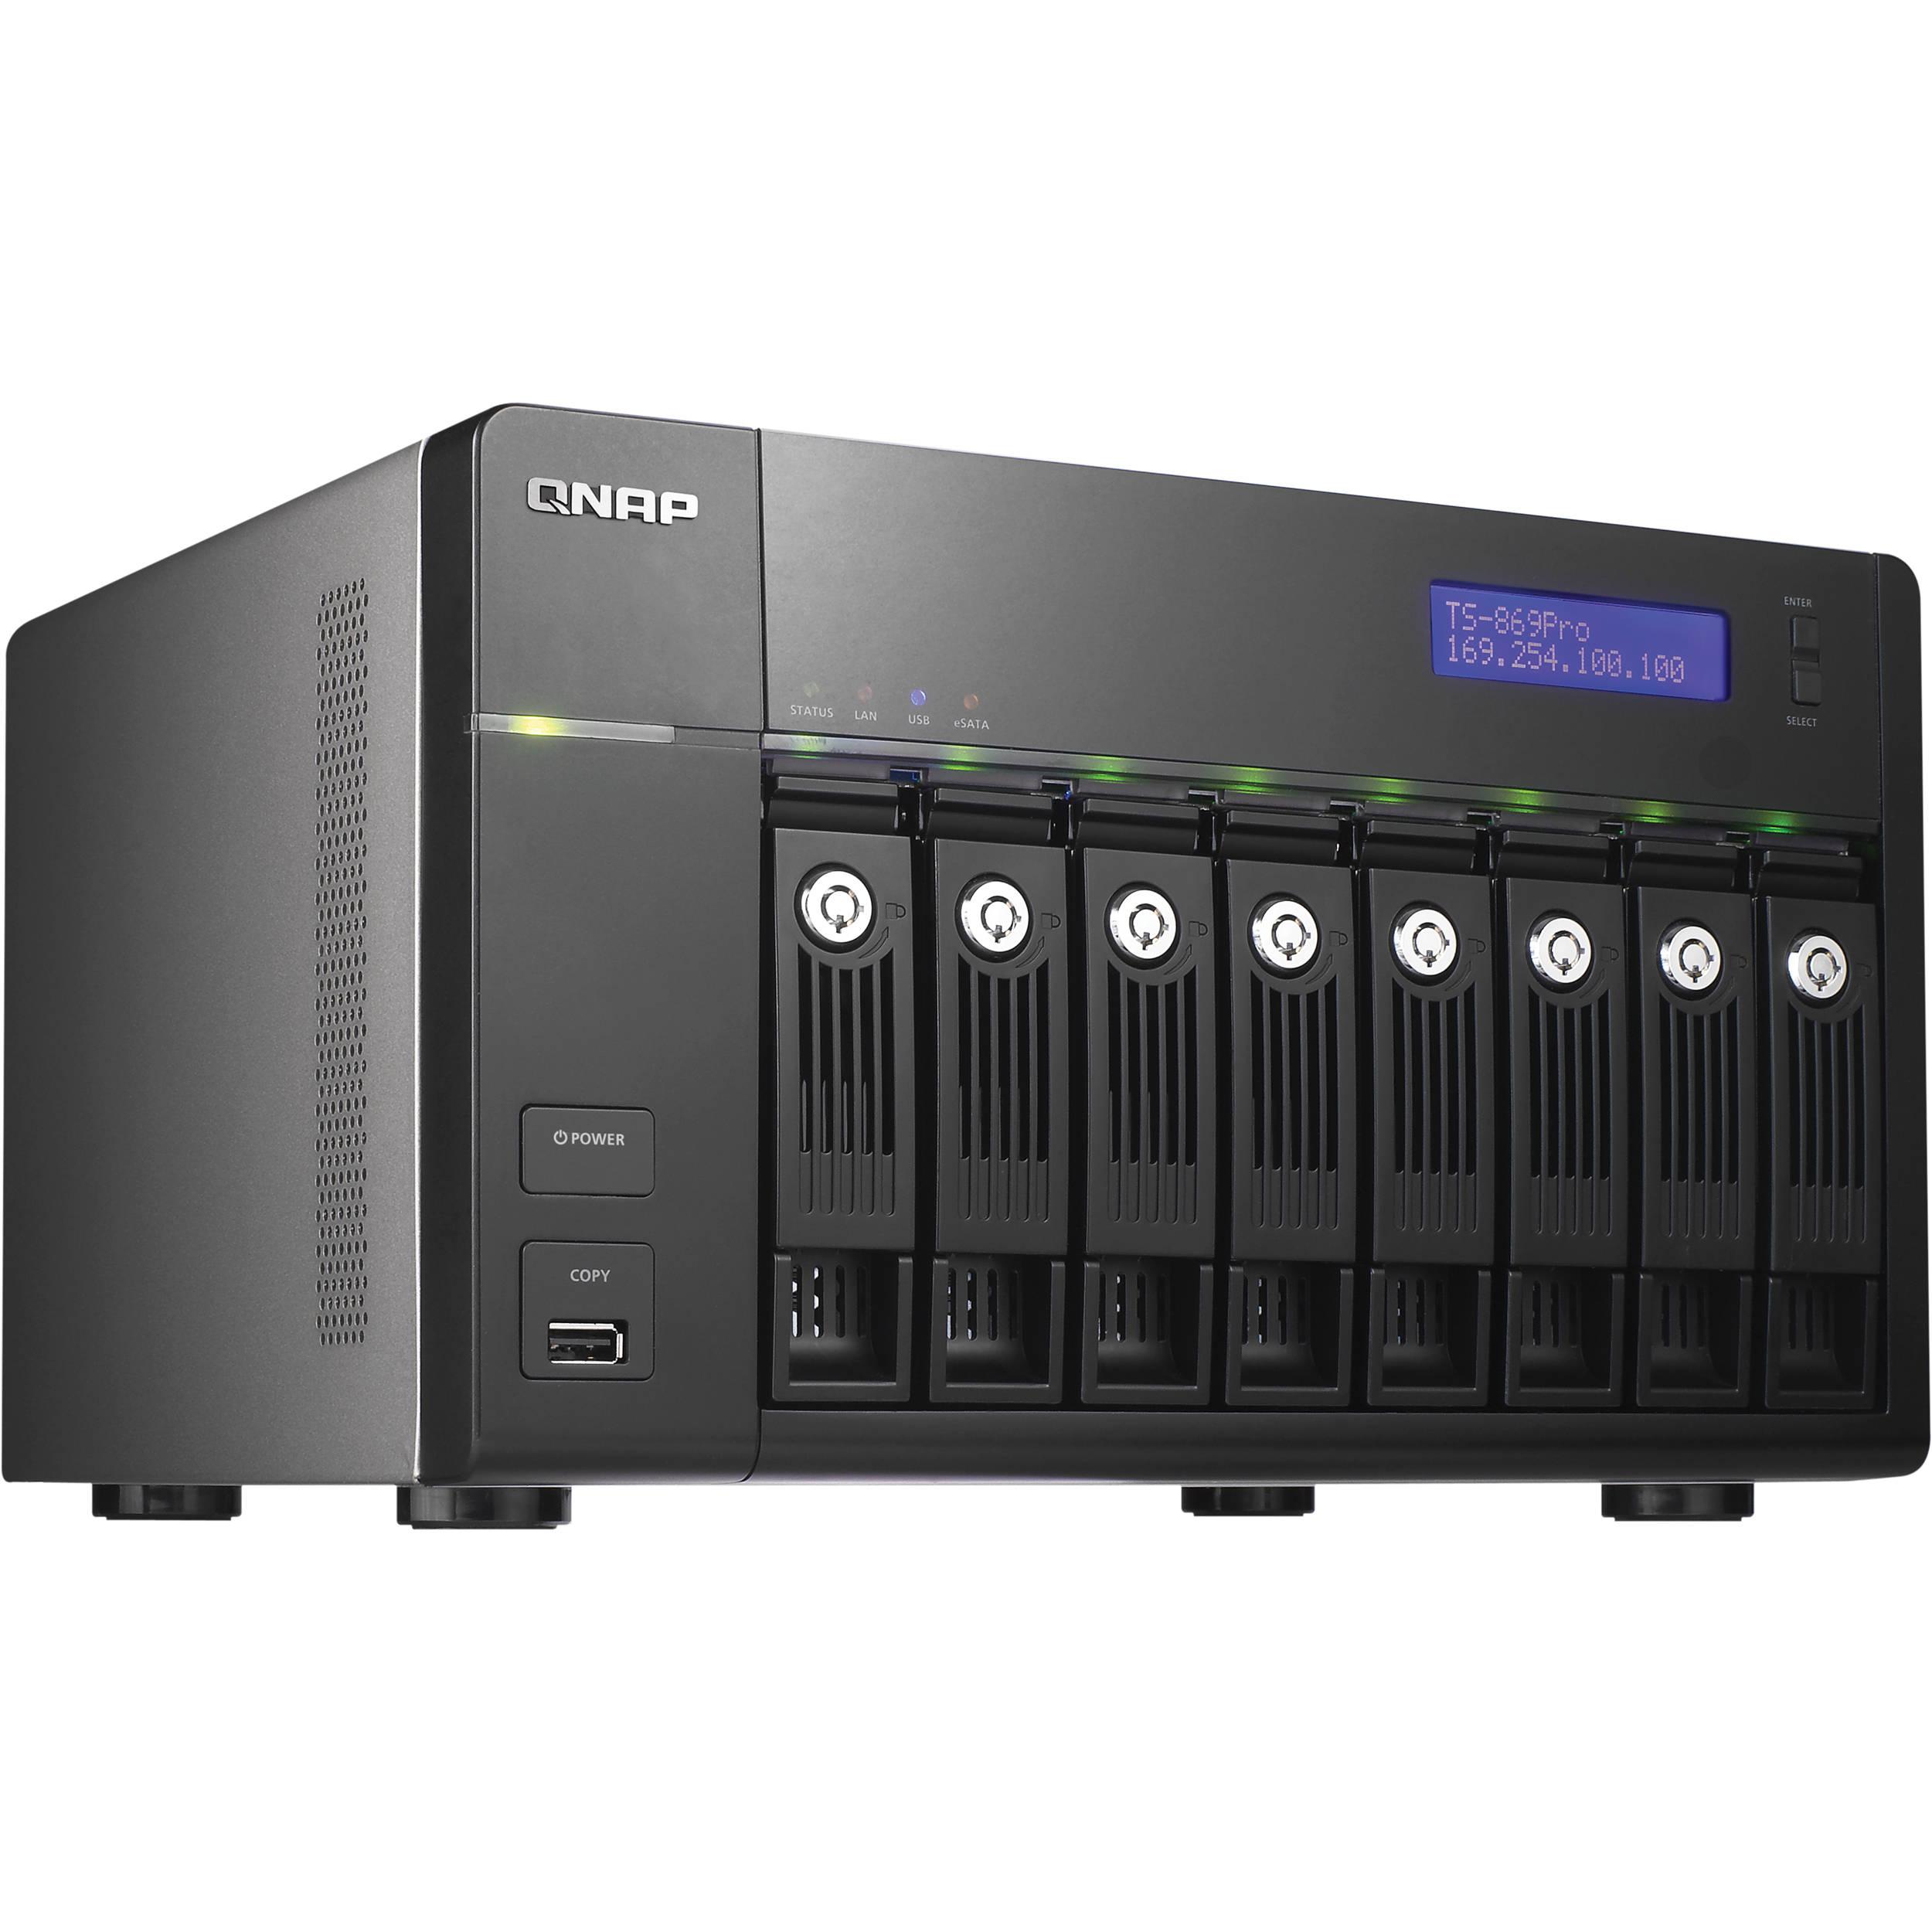 QNAP TS-869 Pro Turbo NAS Server TS-869-PRO-US B&H Photo Video